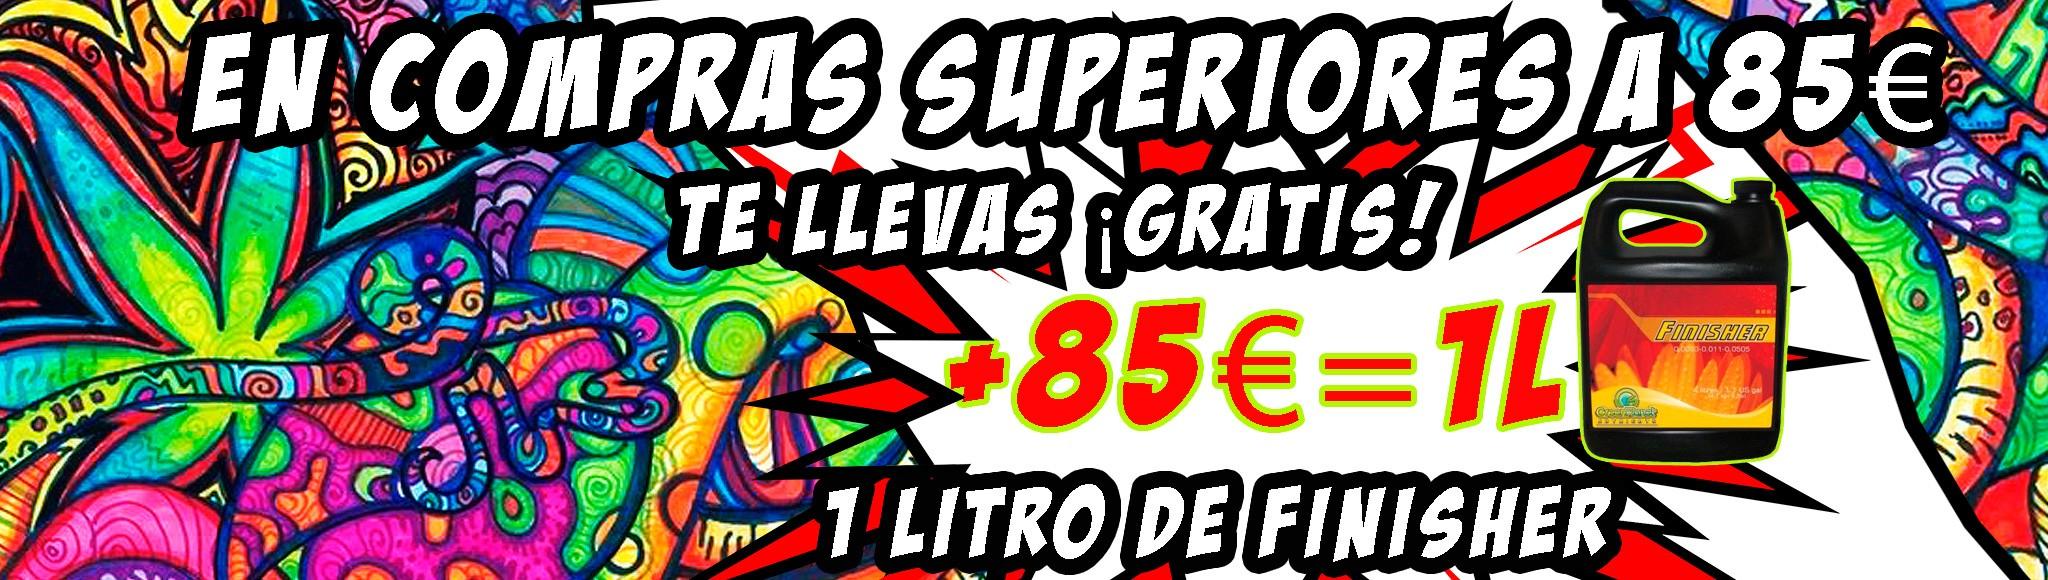 Oferta en compras superiores a 85€